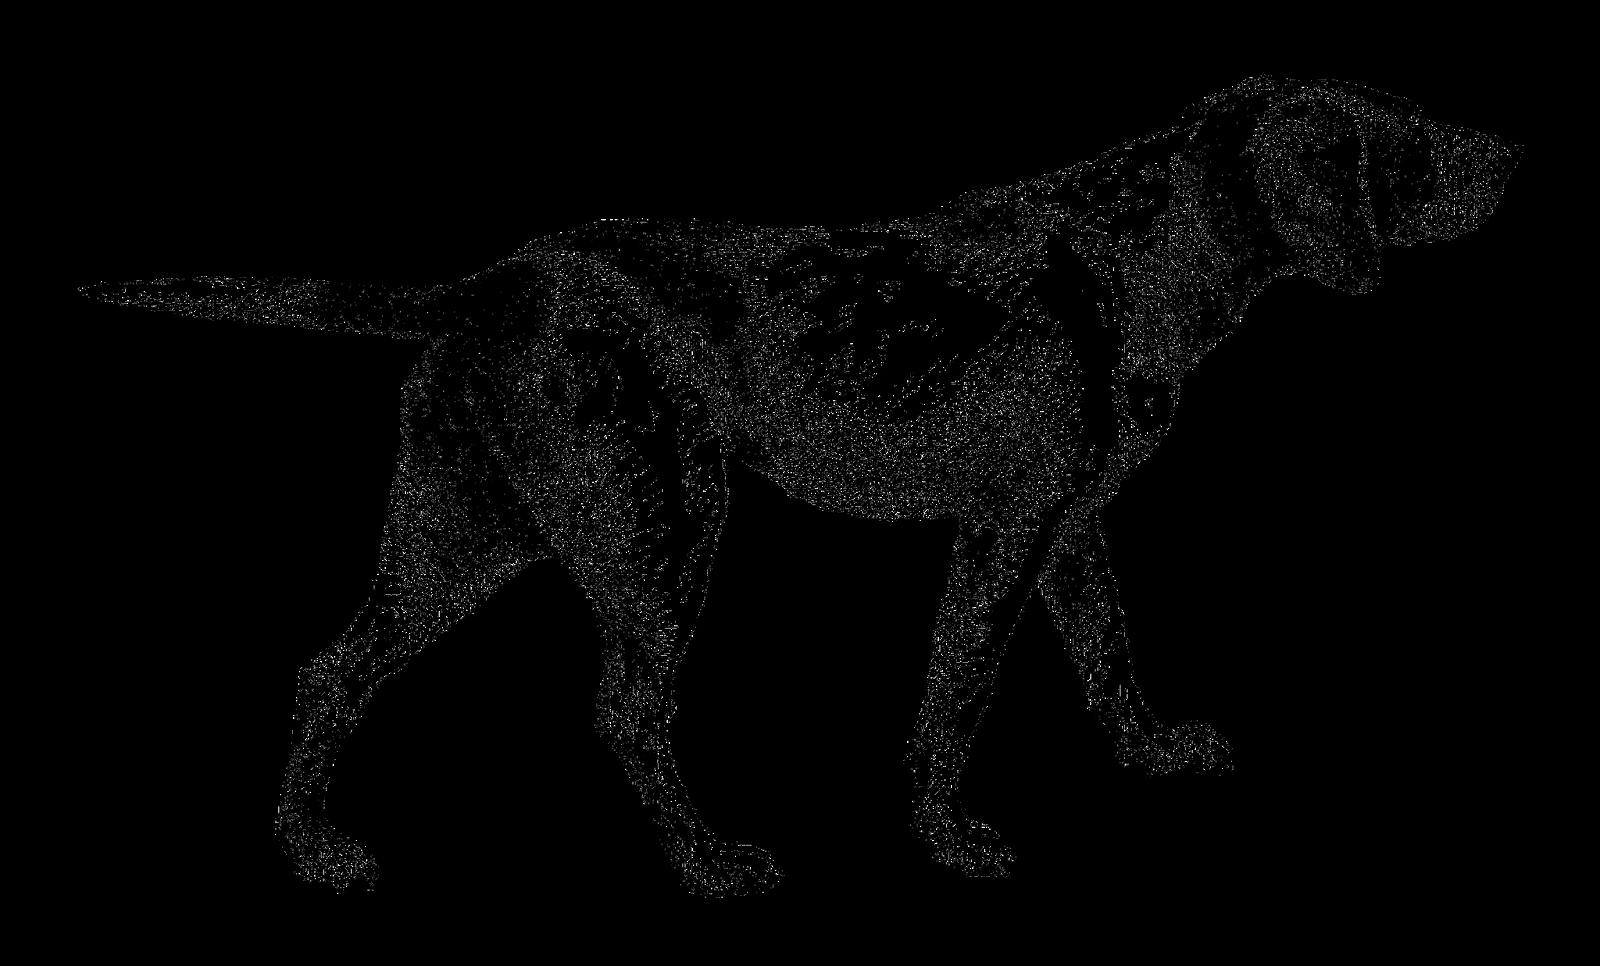 Sleigh clipart dog. Digital stamp design september